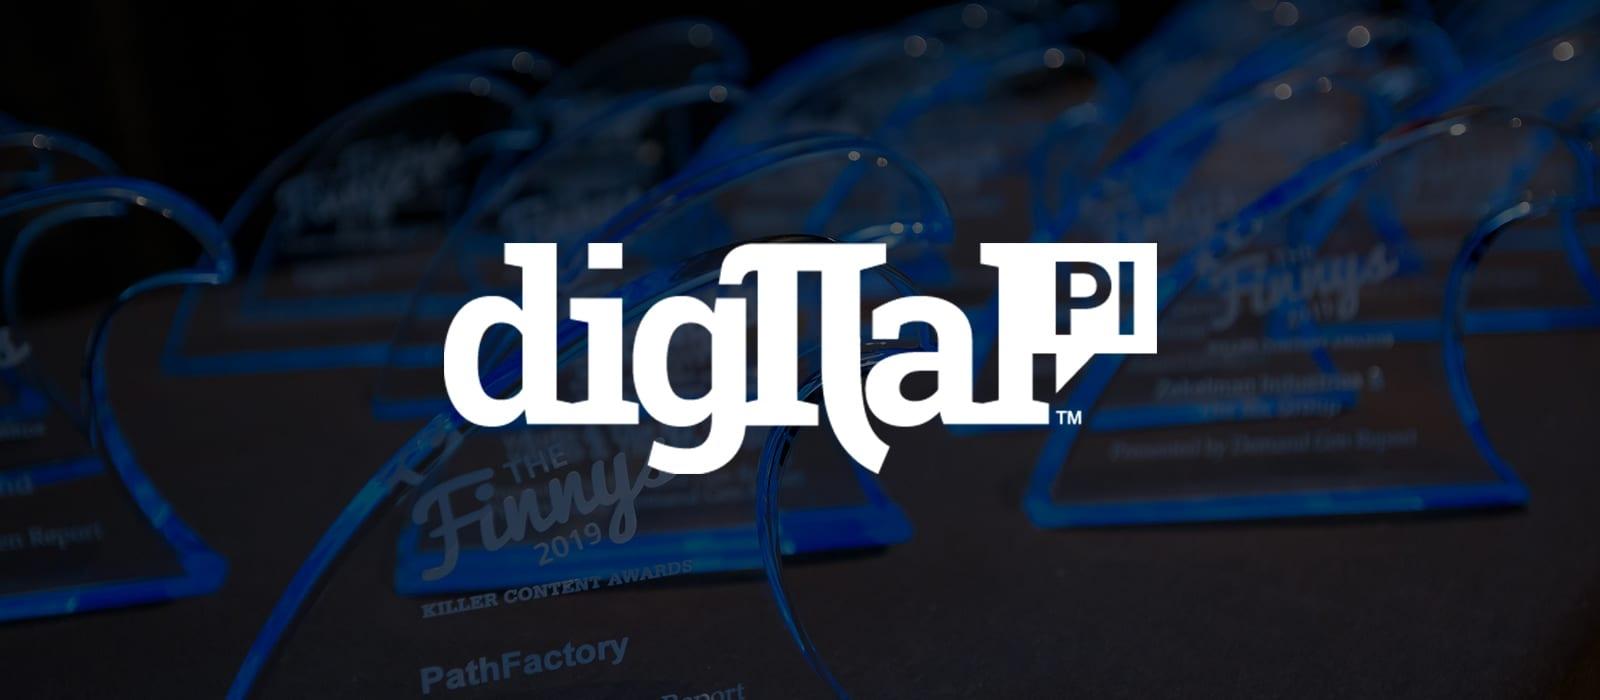 kcs_blog_header_-_digital_pi